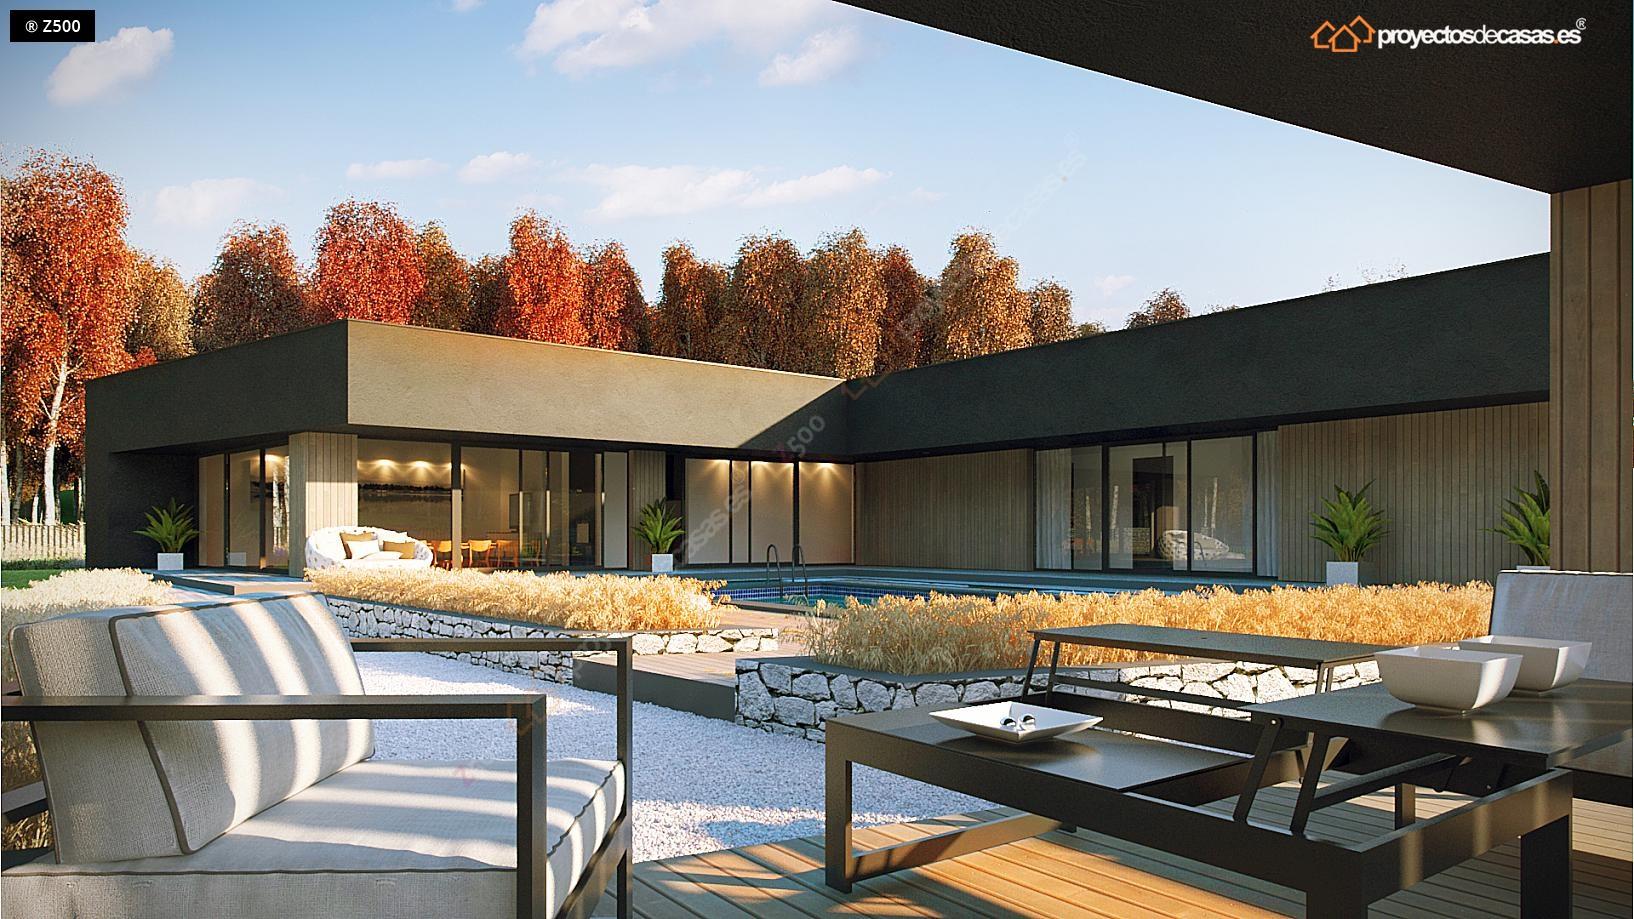 Proyectosdecasas dise amos y construimos casas en toda for Fotos de casas modernas de una planta